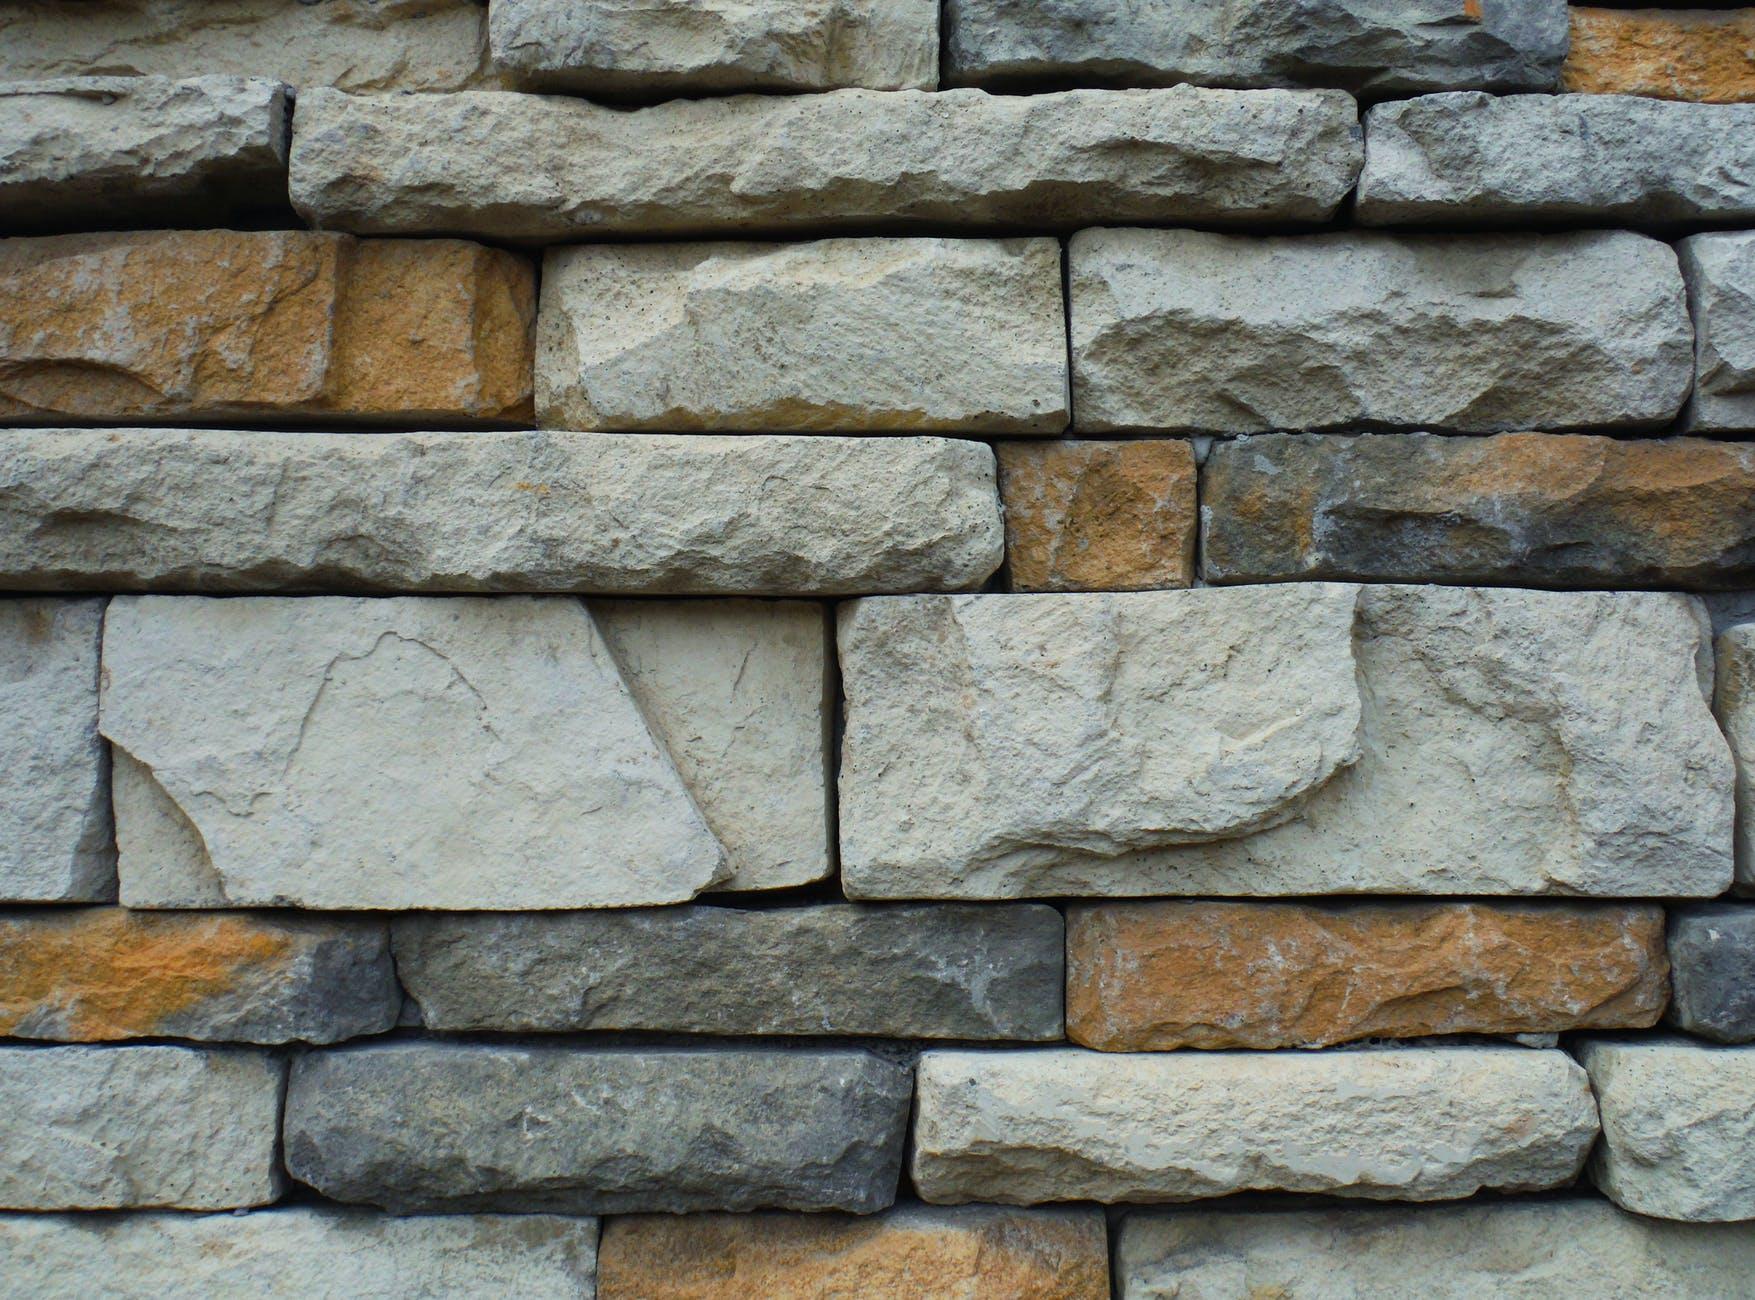 A close-up of a brick wall.